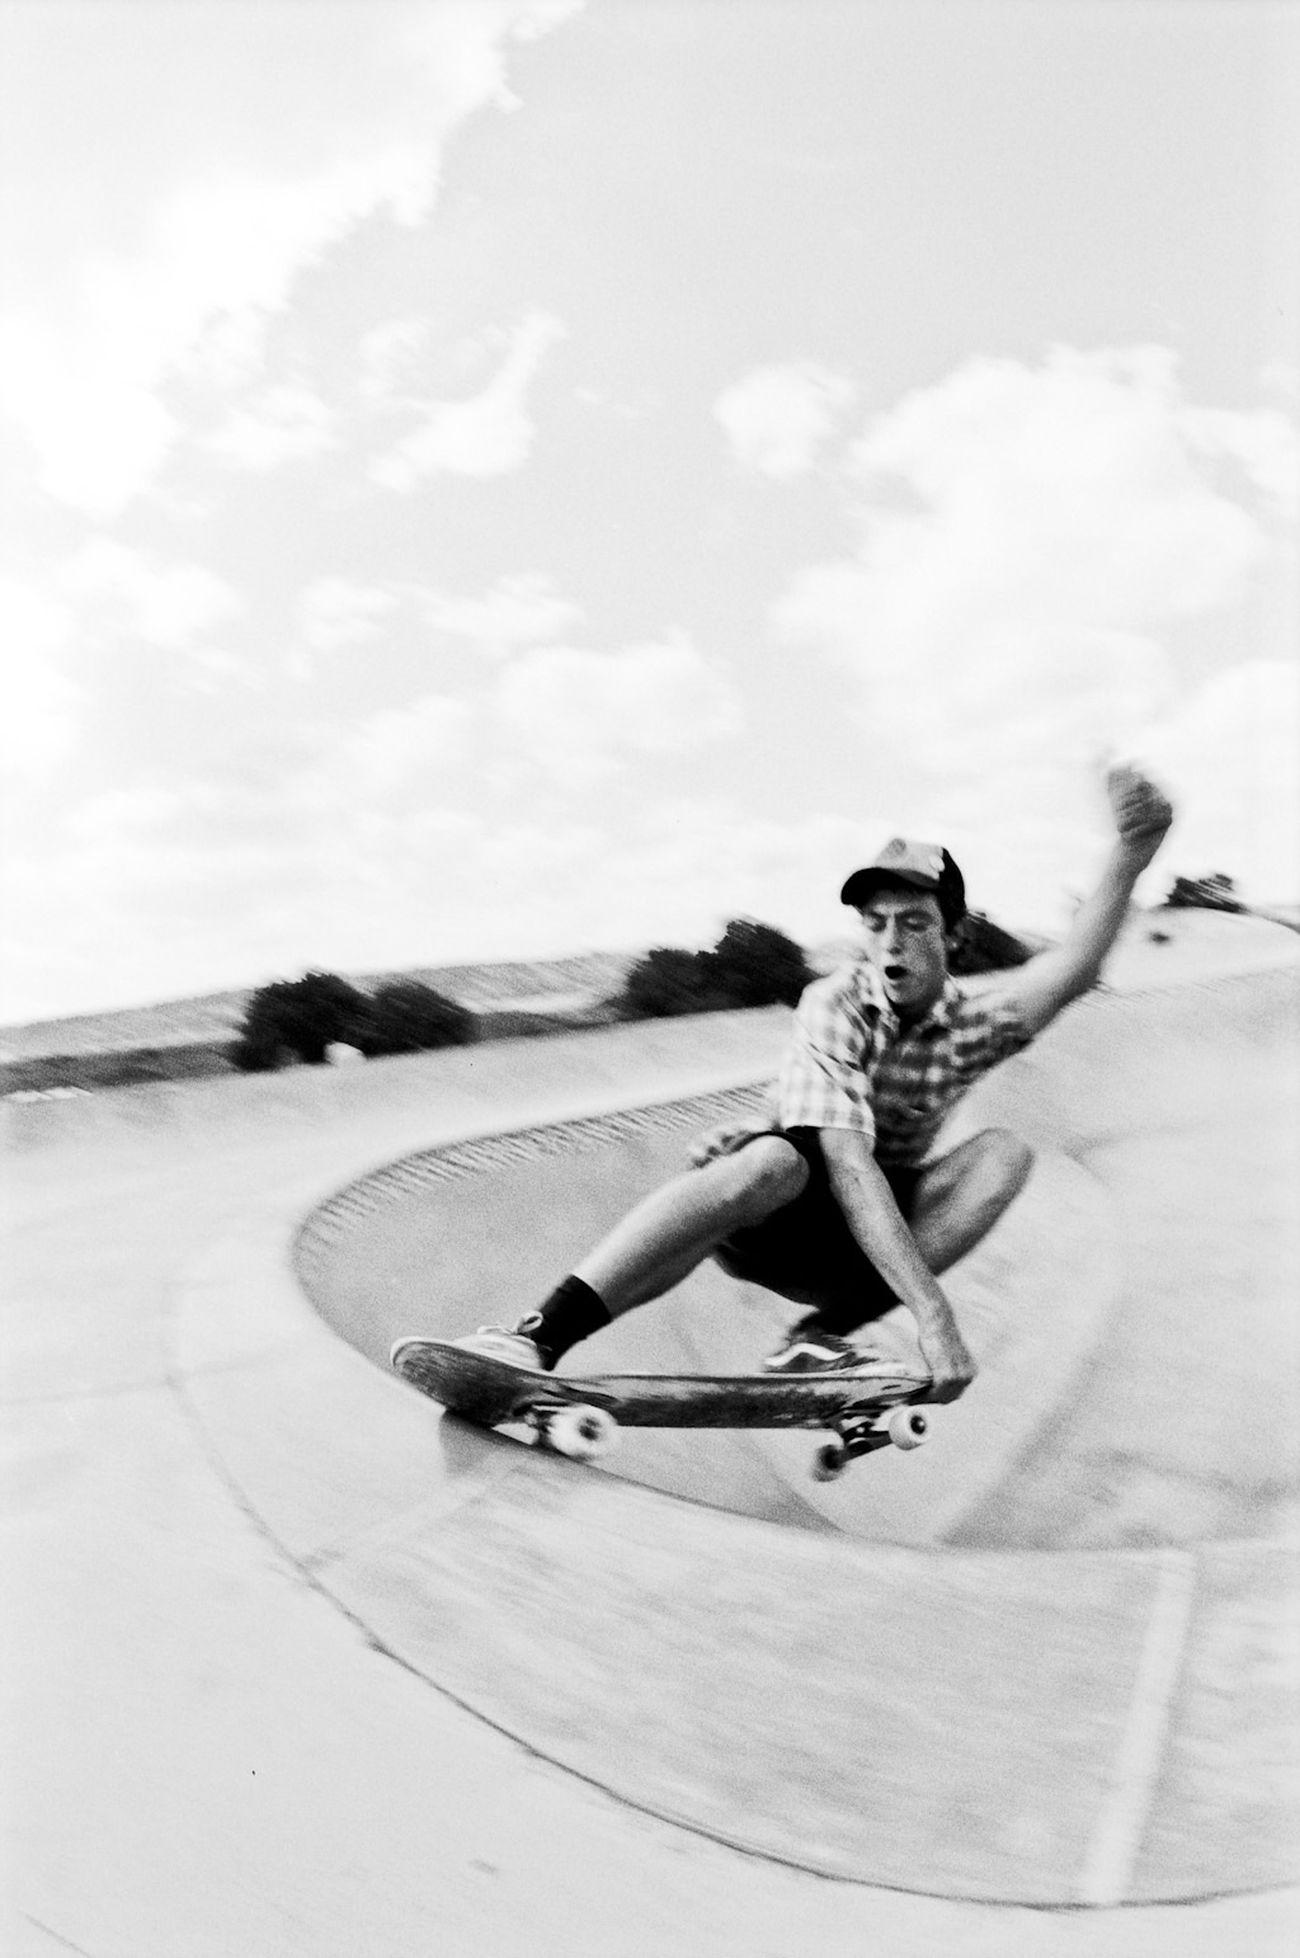 Capturing Movement Skateboarding Blackandwhite Film Youth Punk The Action Photographer - 2015 EyeEm Awards